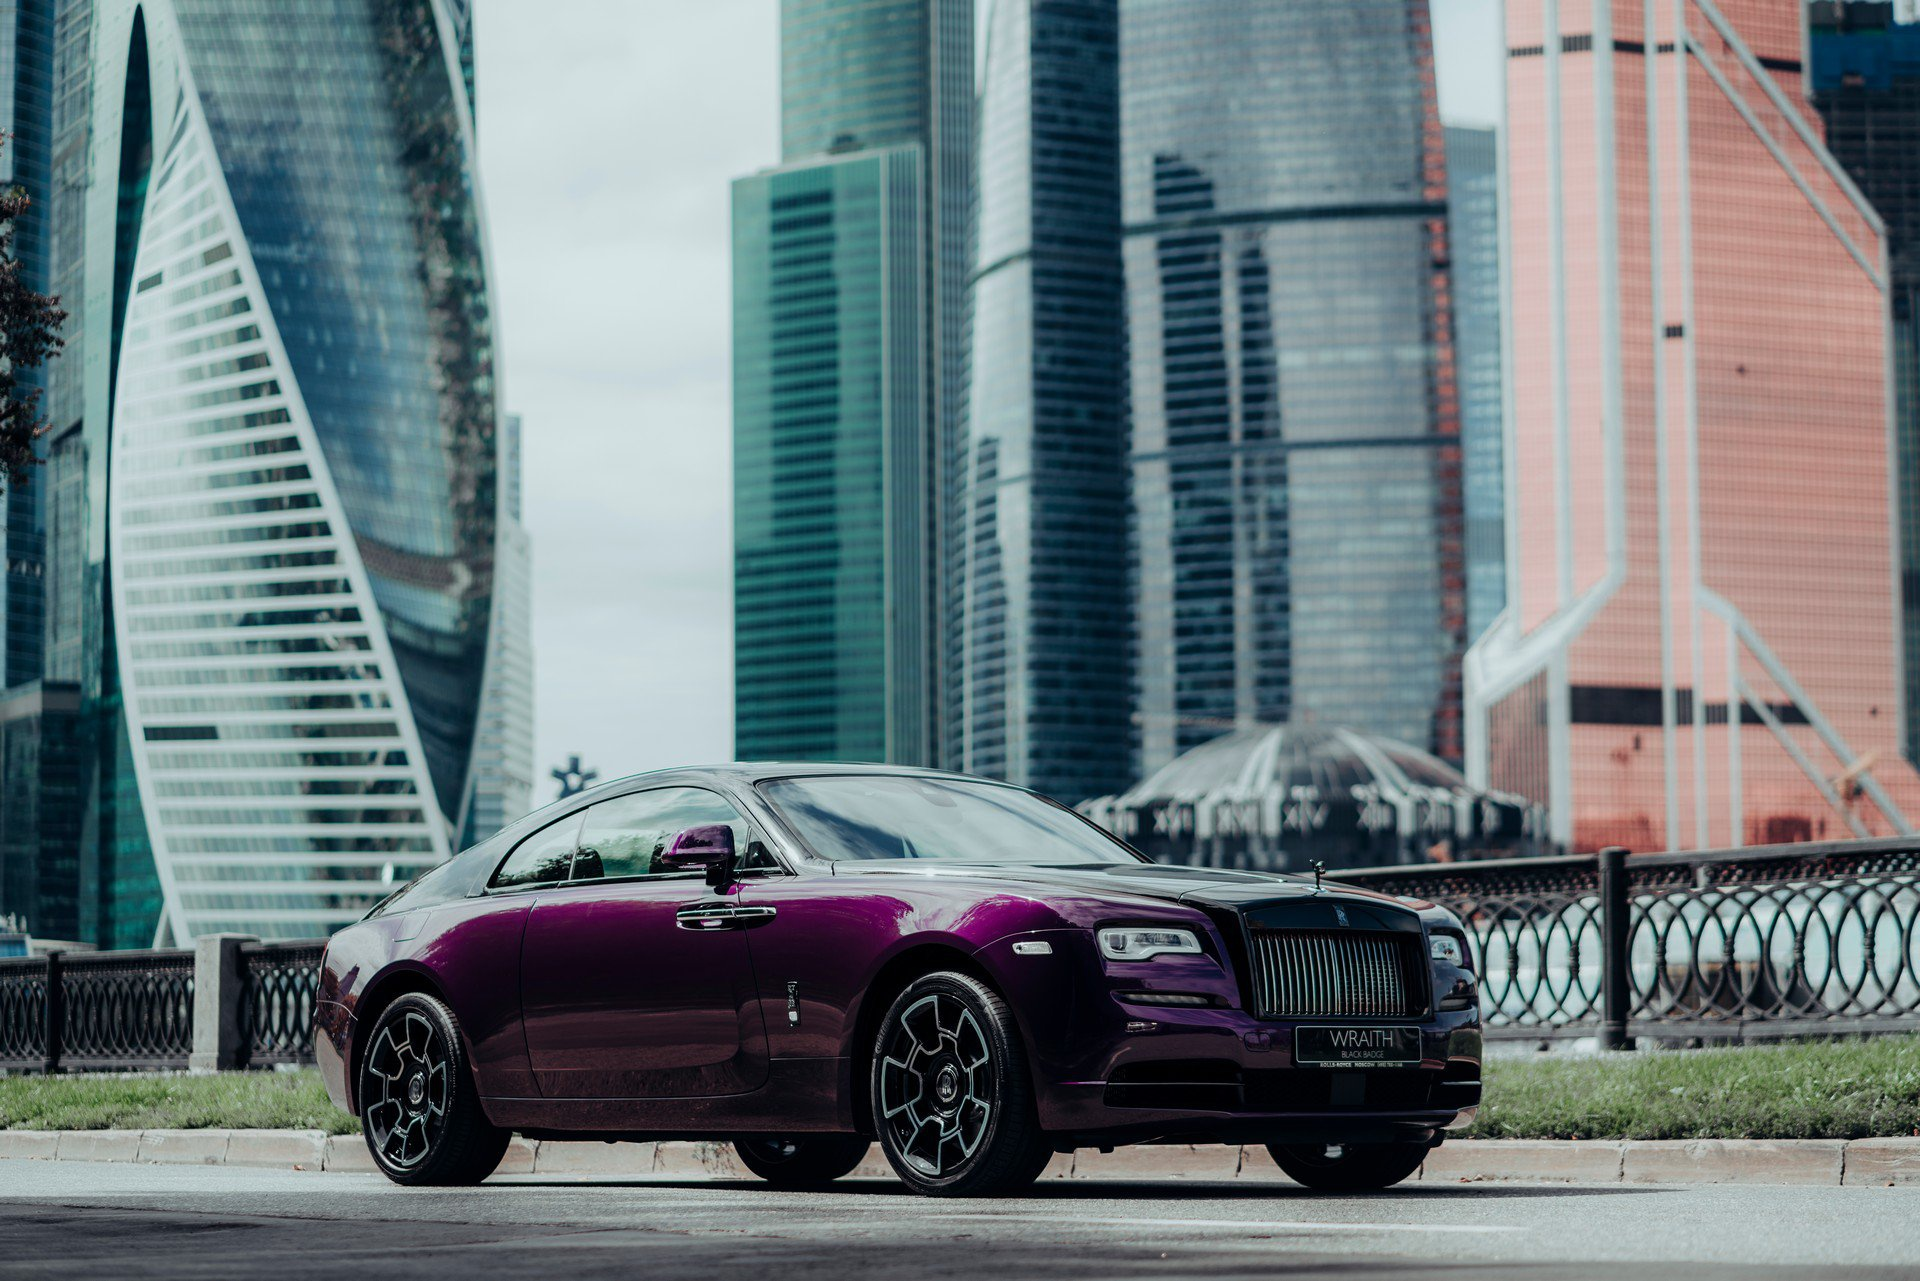 Ngam bo suu tap Rolls-Royce dac biet 'Dem Moscow' hinh anh 3